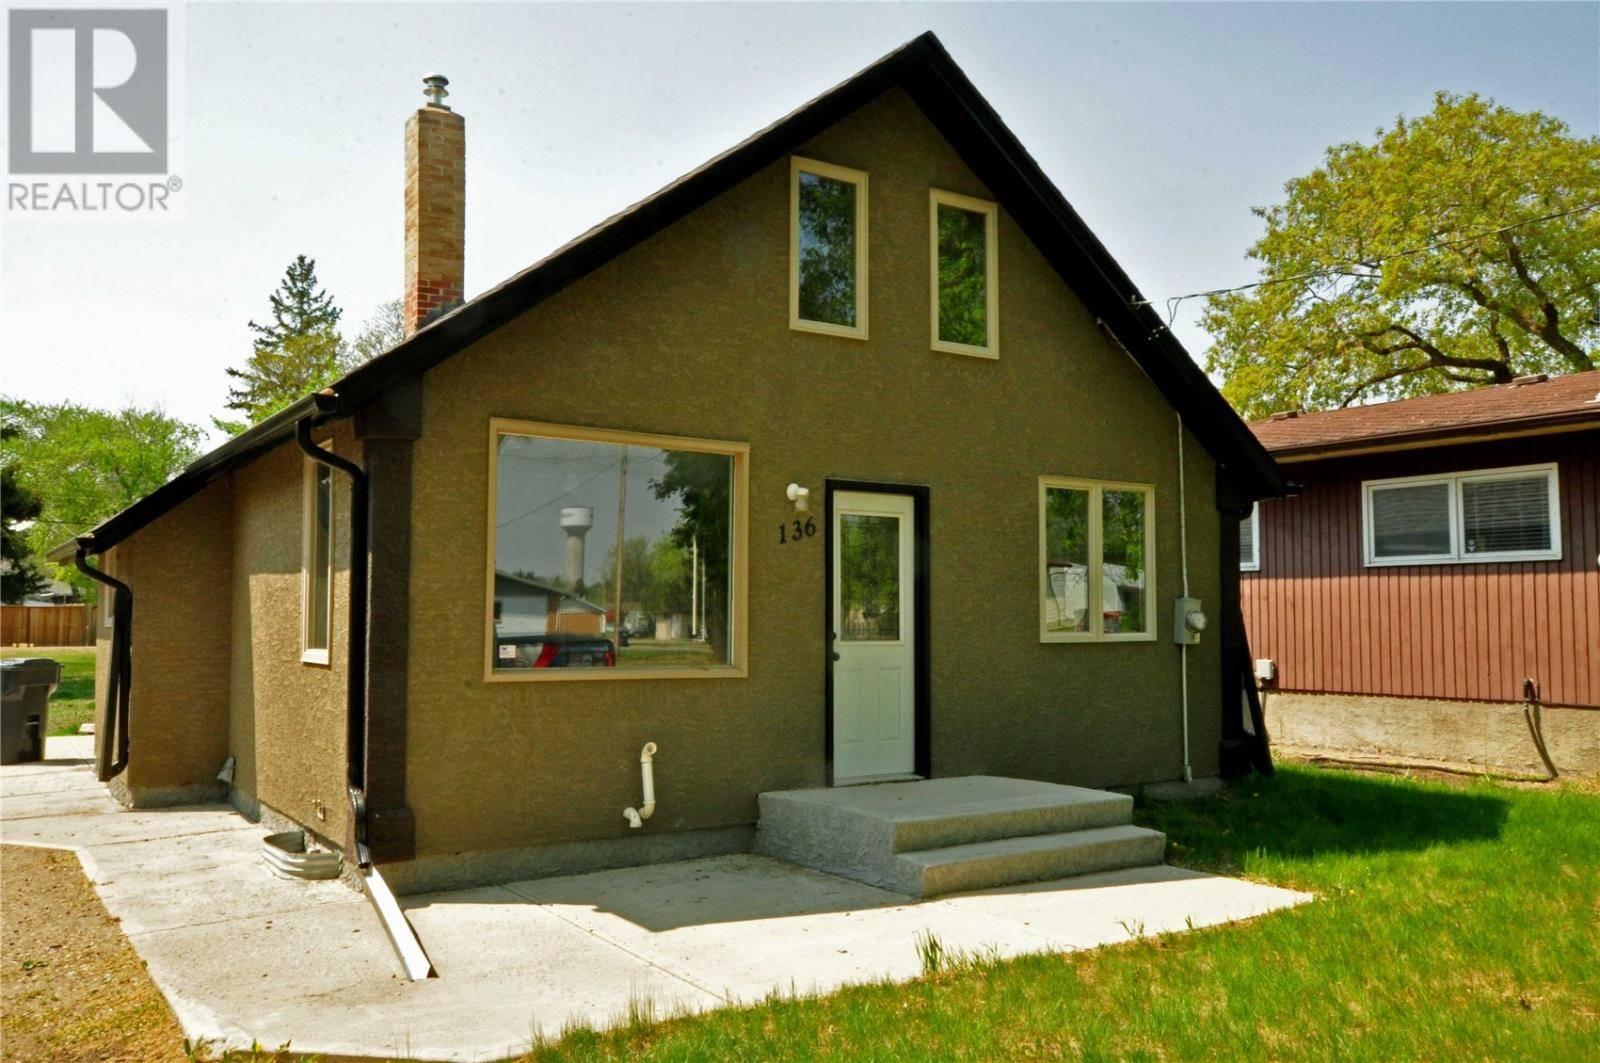 House for sale at 136 Gladstone Ave S Yorkton Saskatchewan - MLS: SK756202